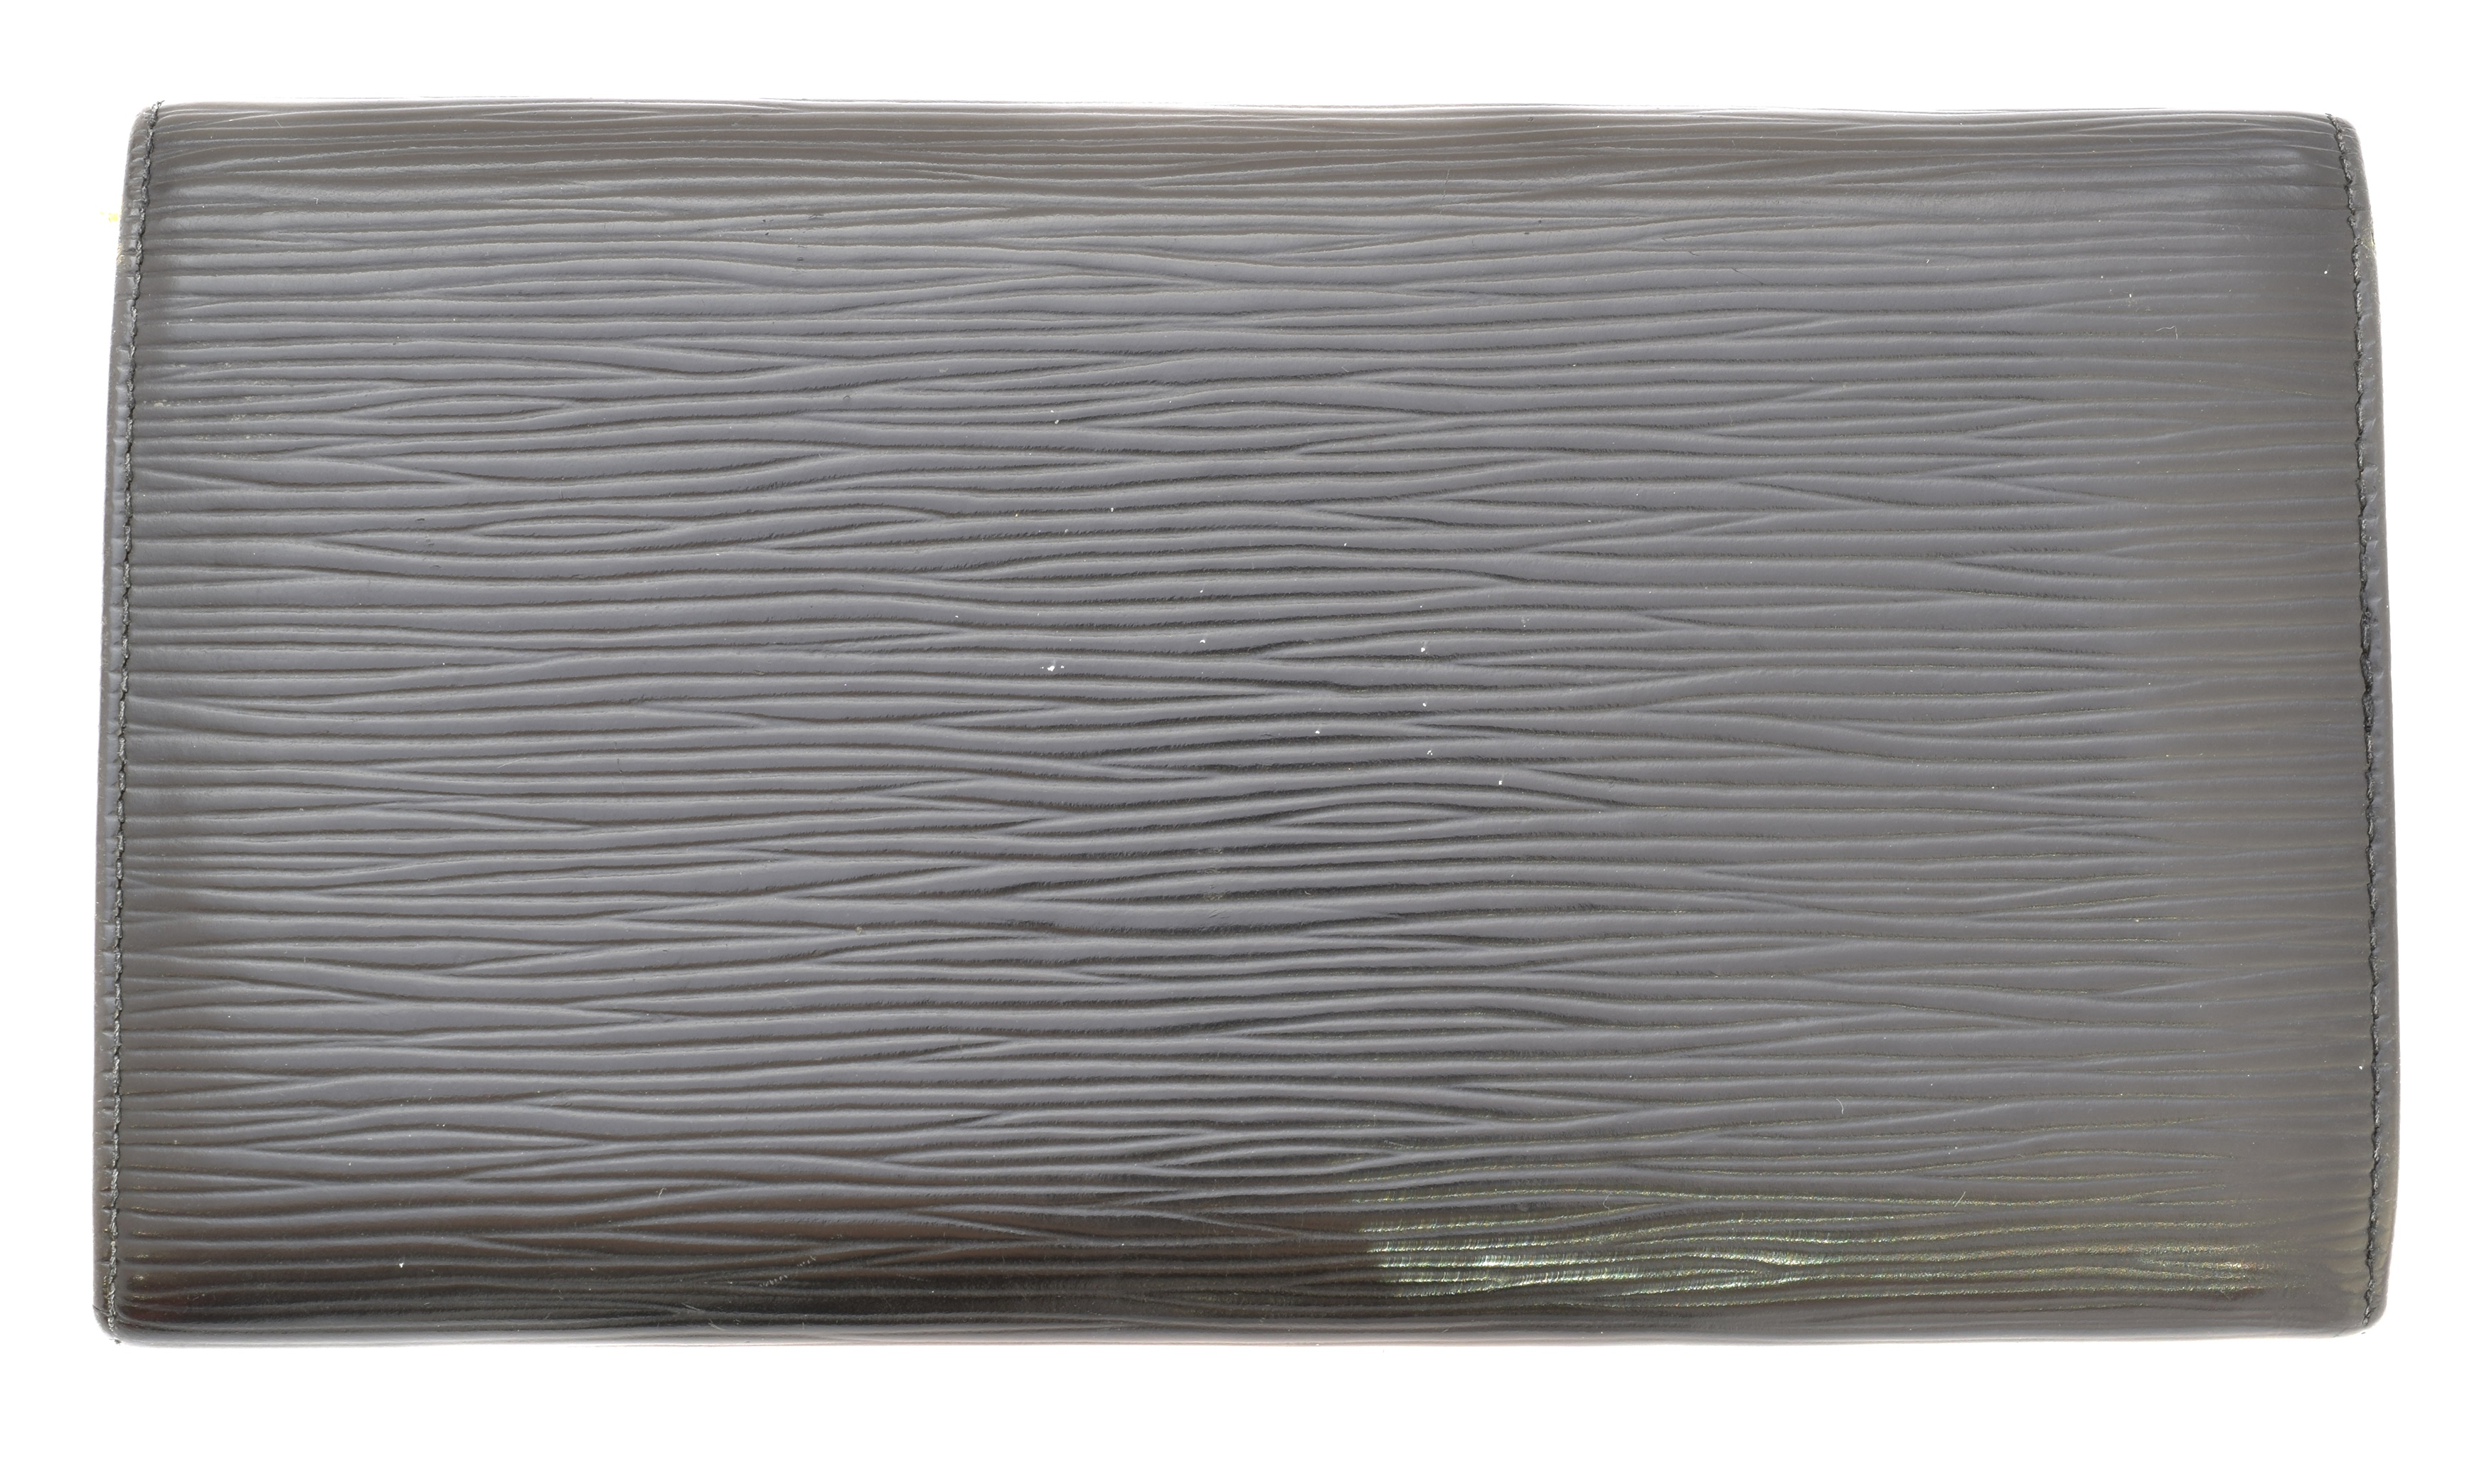 A Louis Vuitton Sarah wallet, - Image 2 of 2